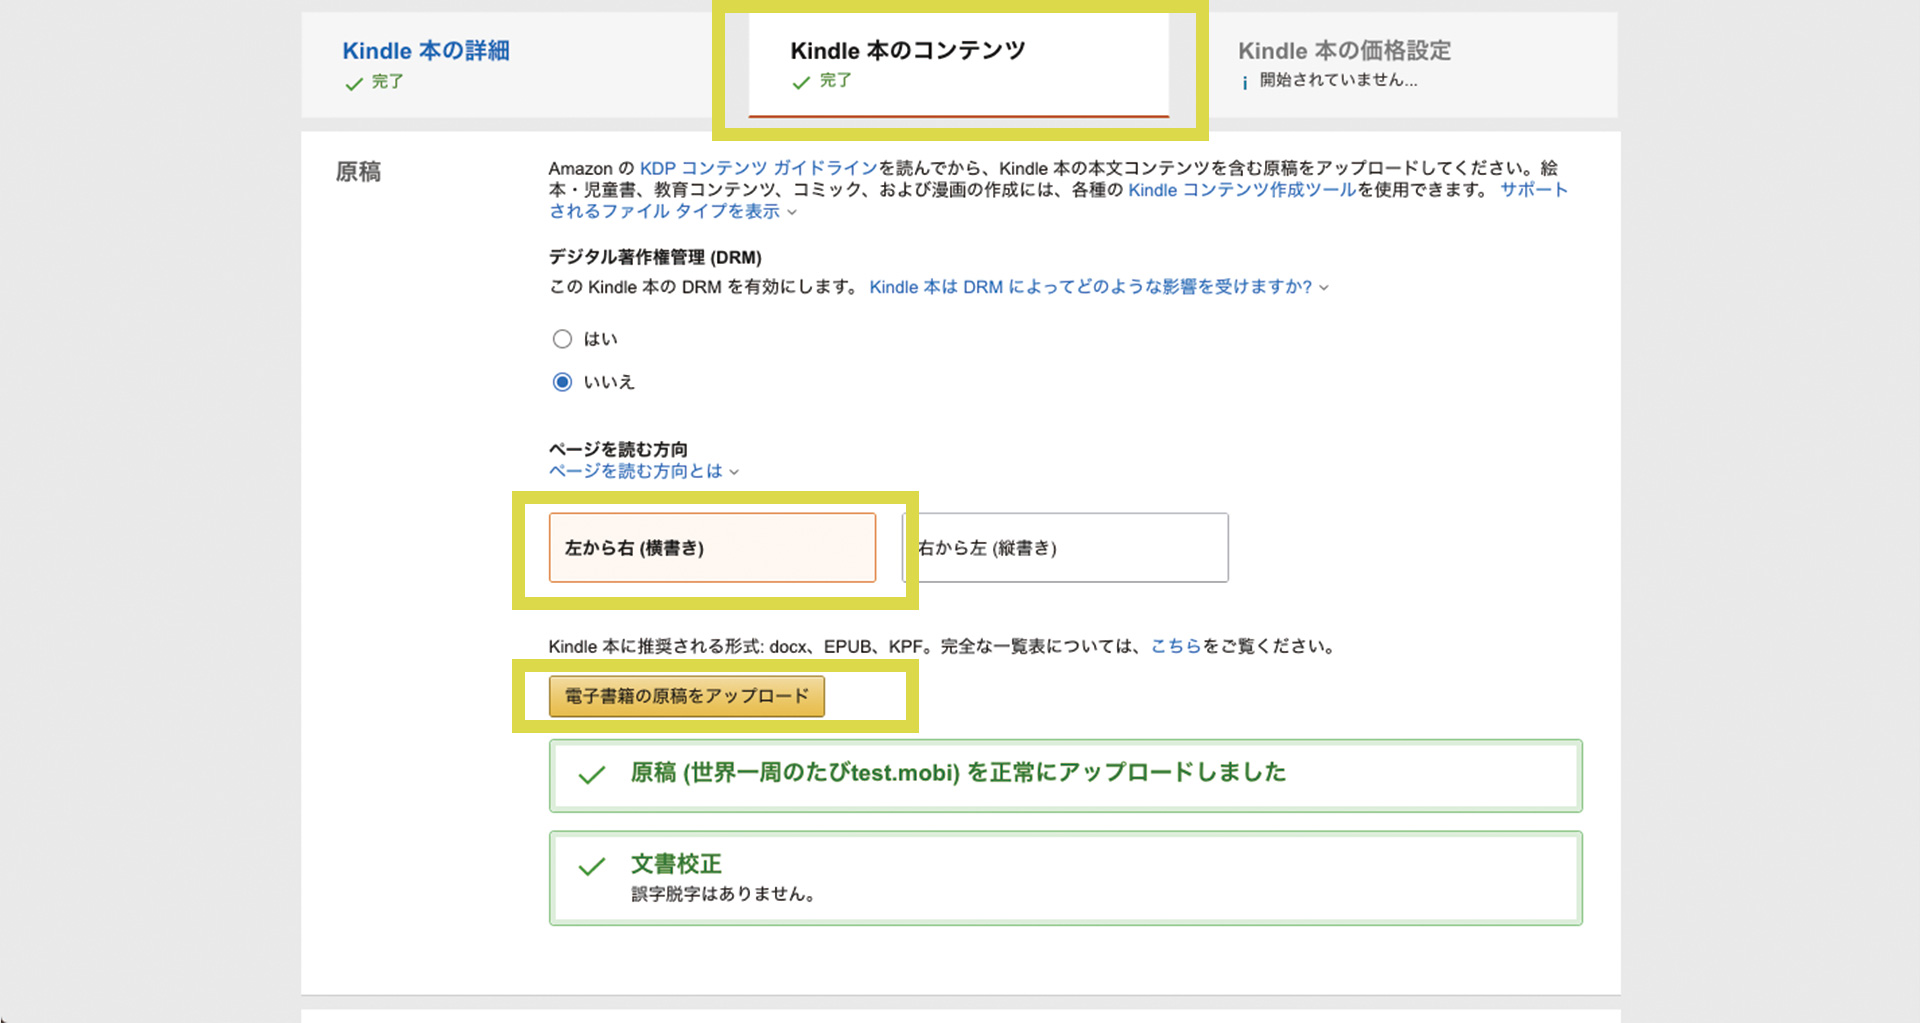 Kindleダイレクトパブリッシングに本のコンテンツを登録